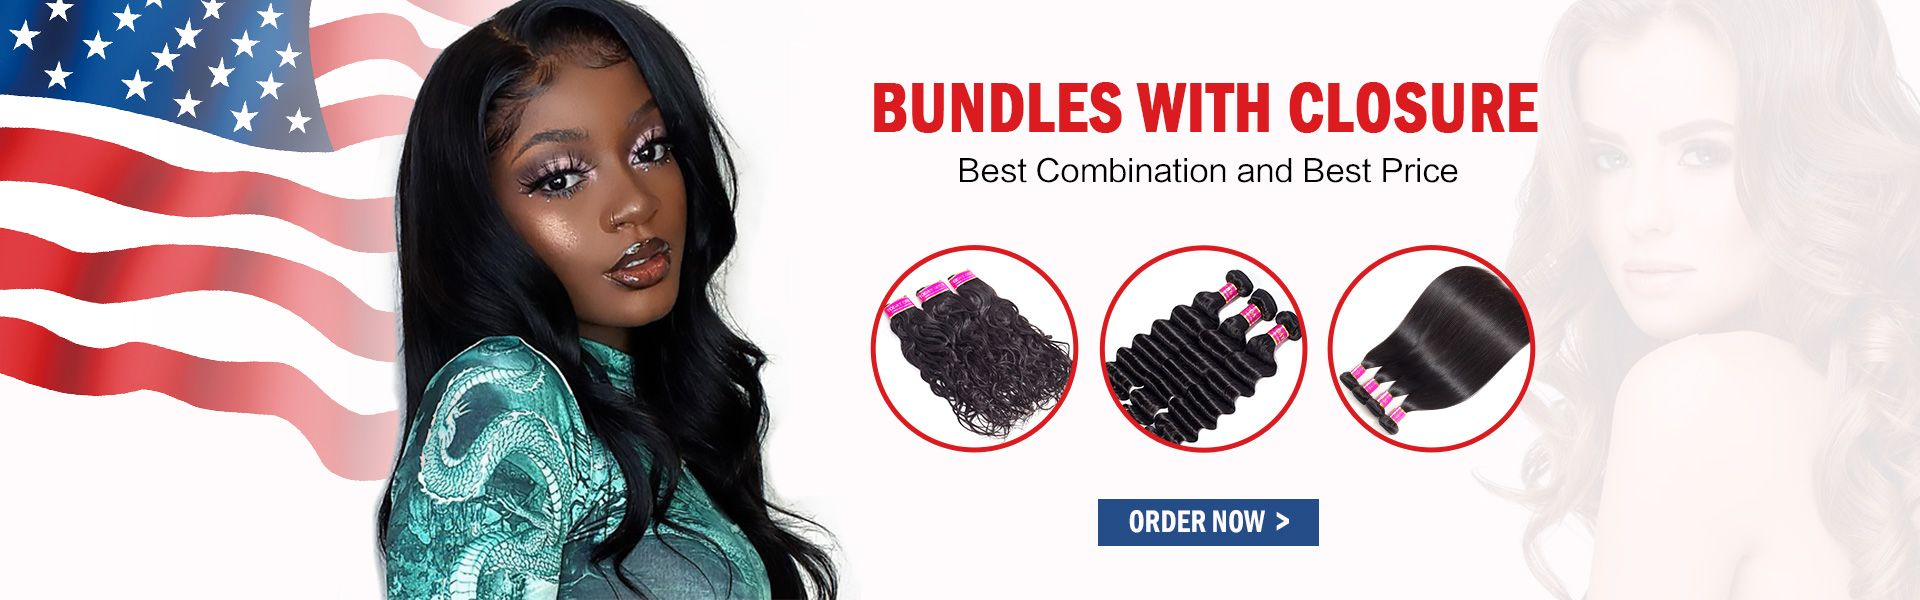 https://www.todayonlyhair.com/hair-bundles-with-closure.html